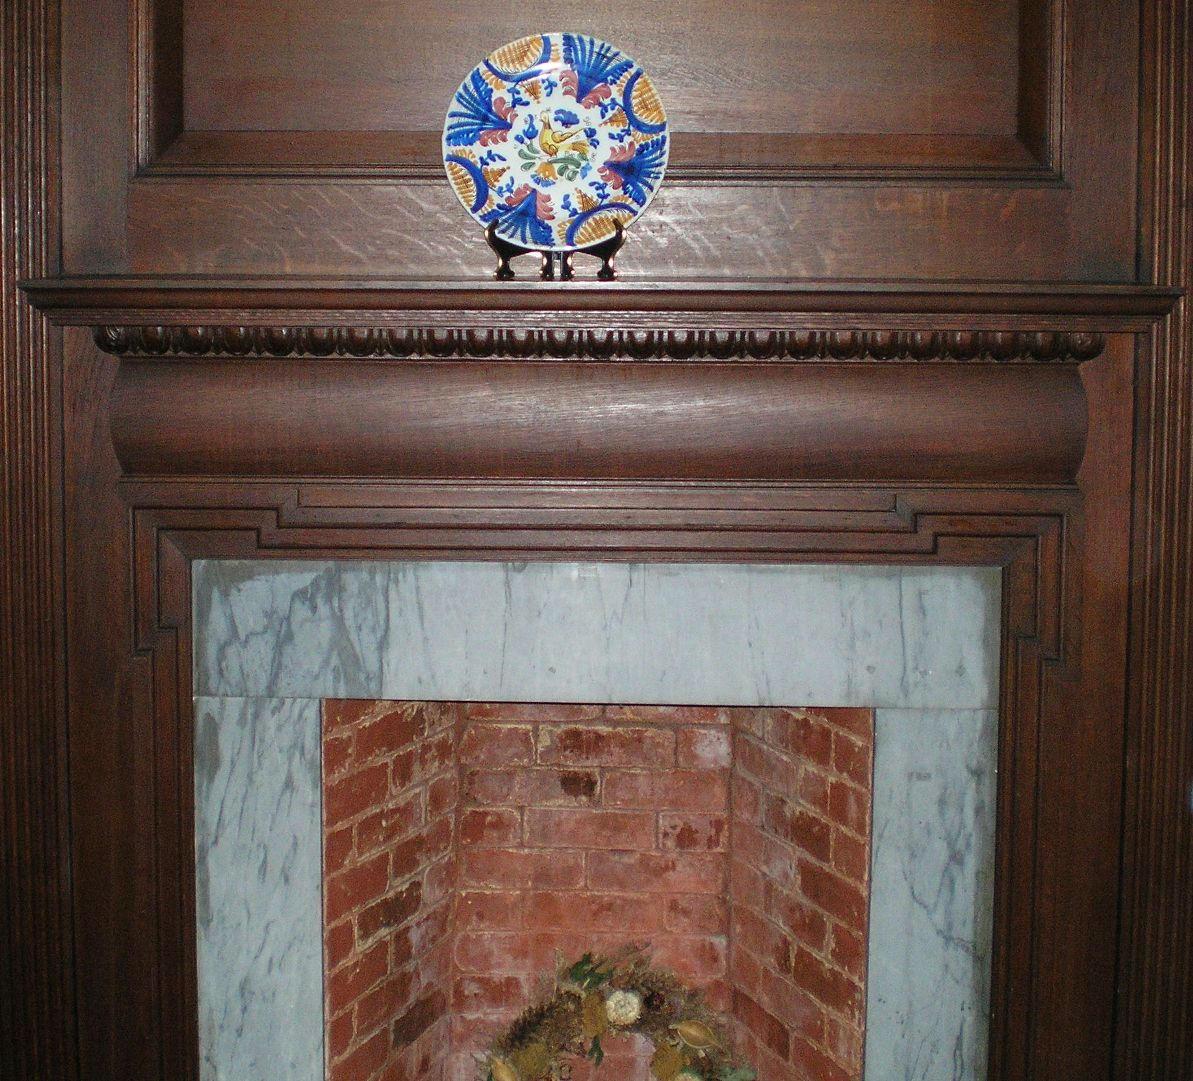 SHWC2006:Dining Area Fireplace by steward